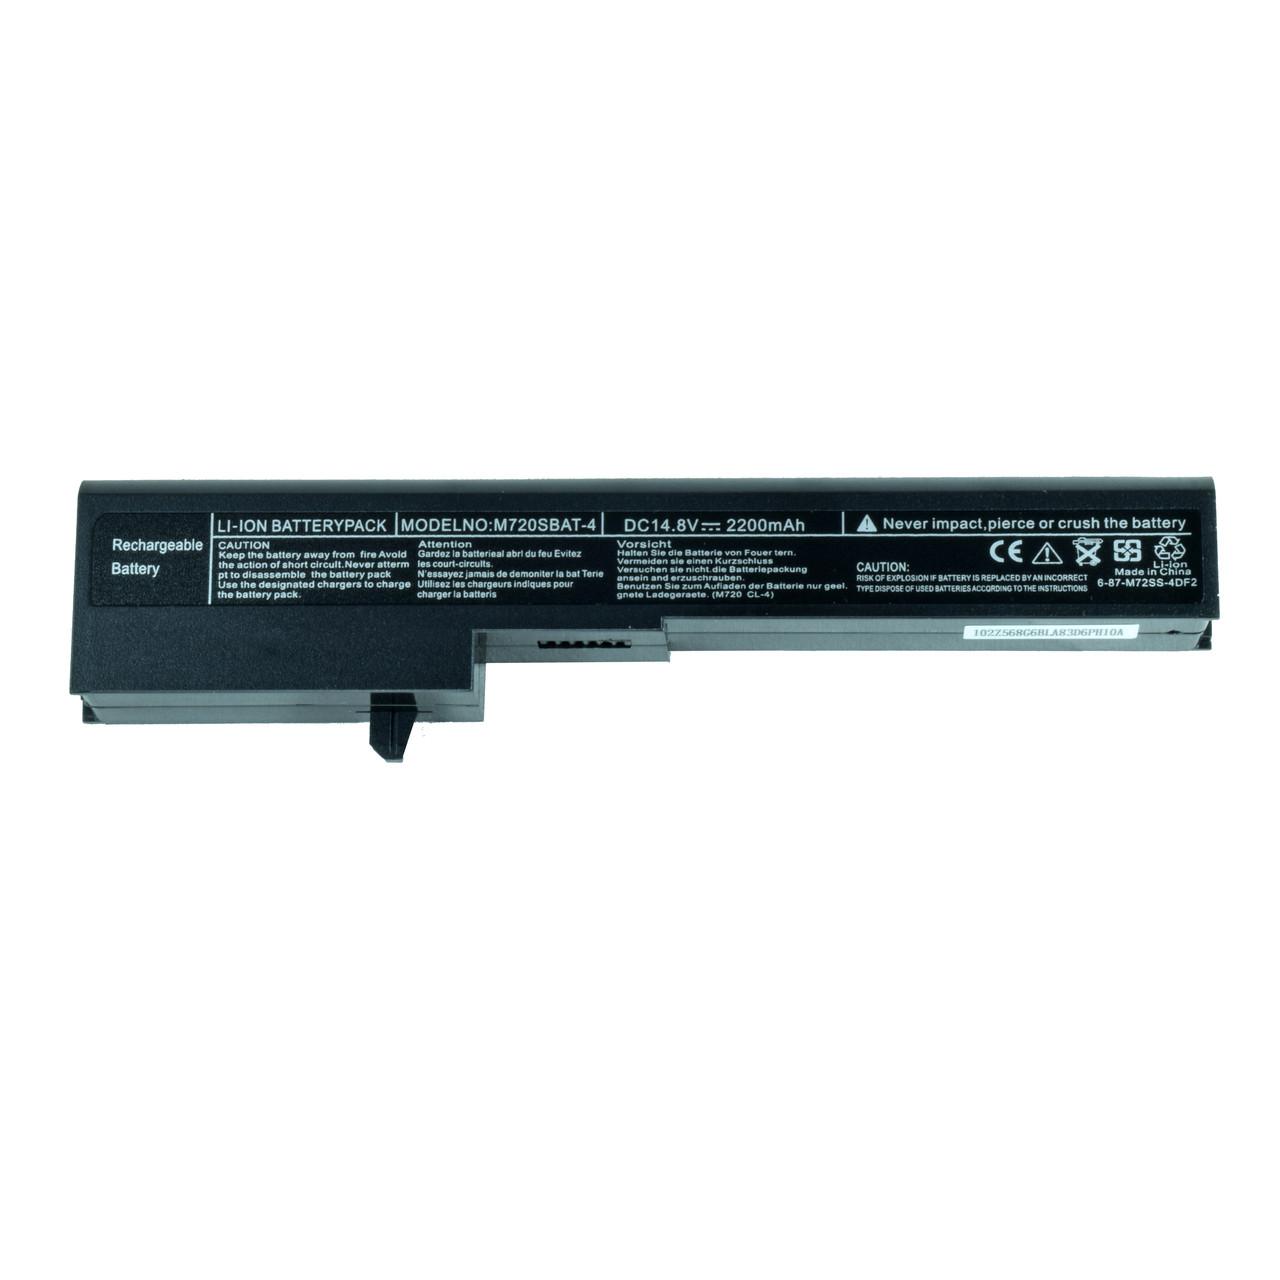 Батарея для ноутбука SHARP M720 FOUNDER S230 HAIRE A20 CLEVO M70S  M720